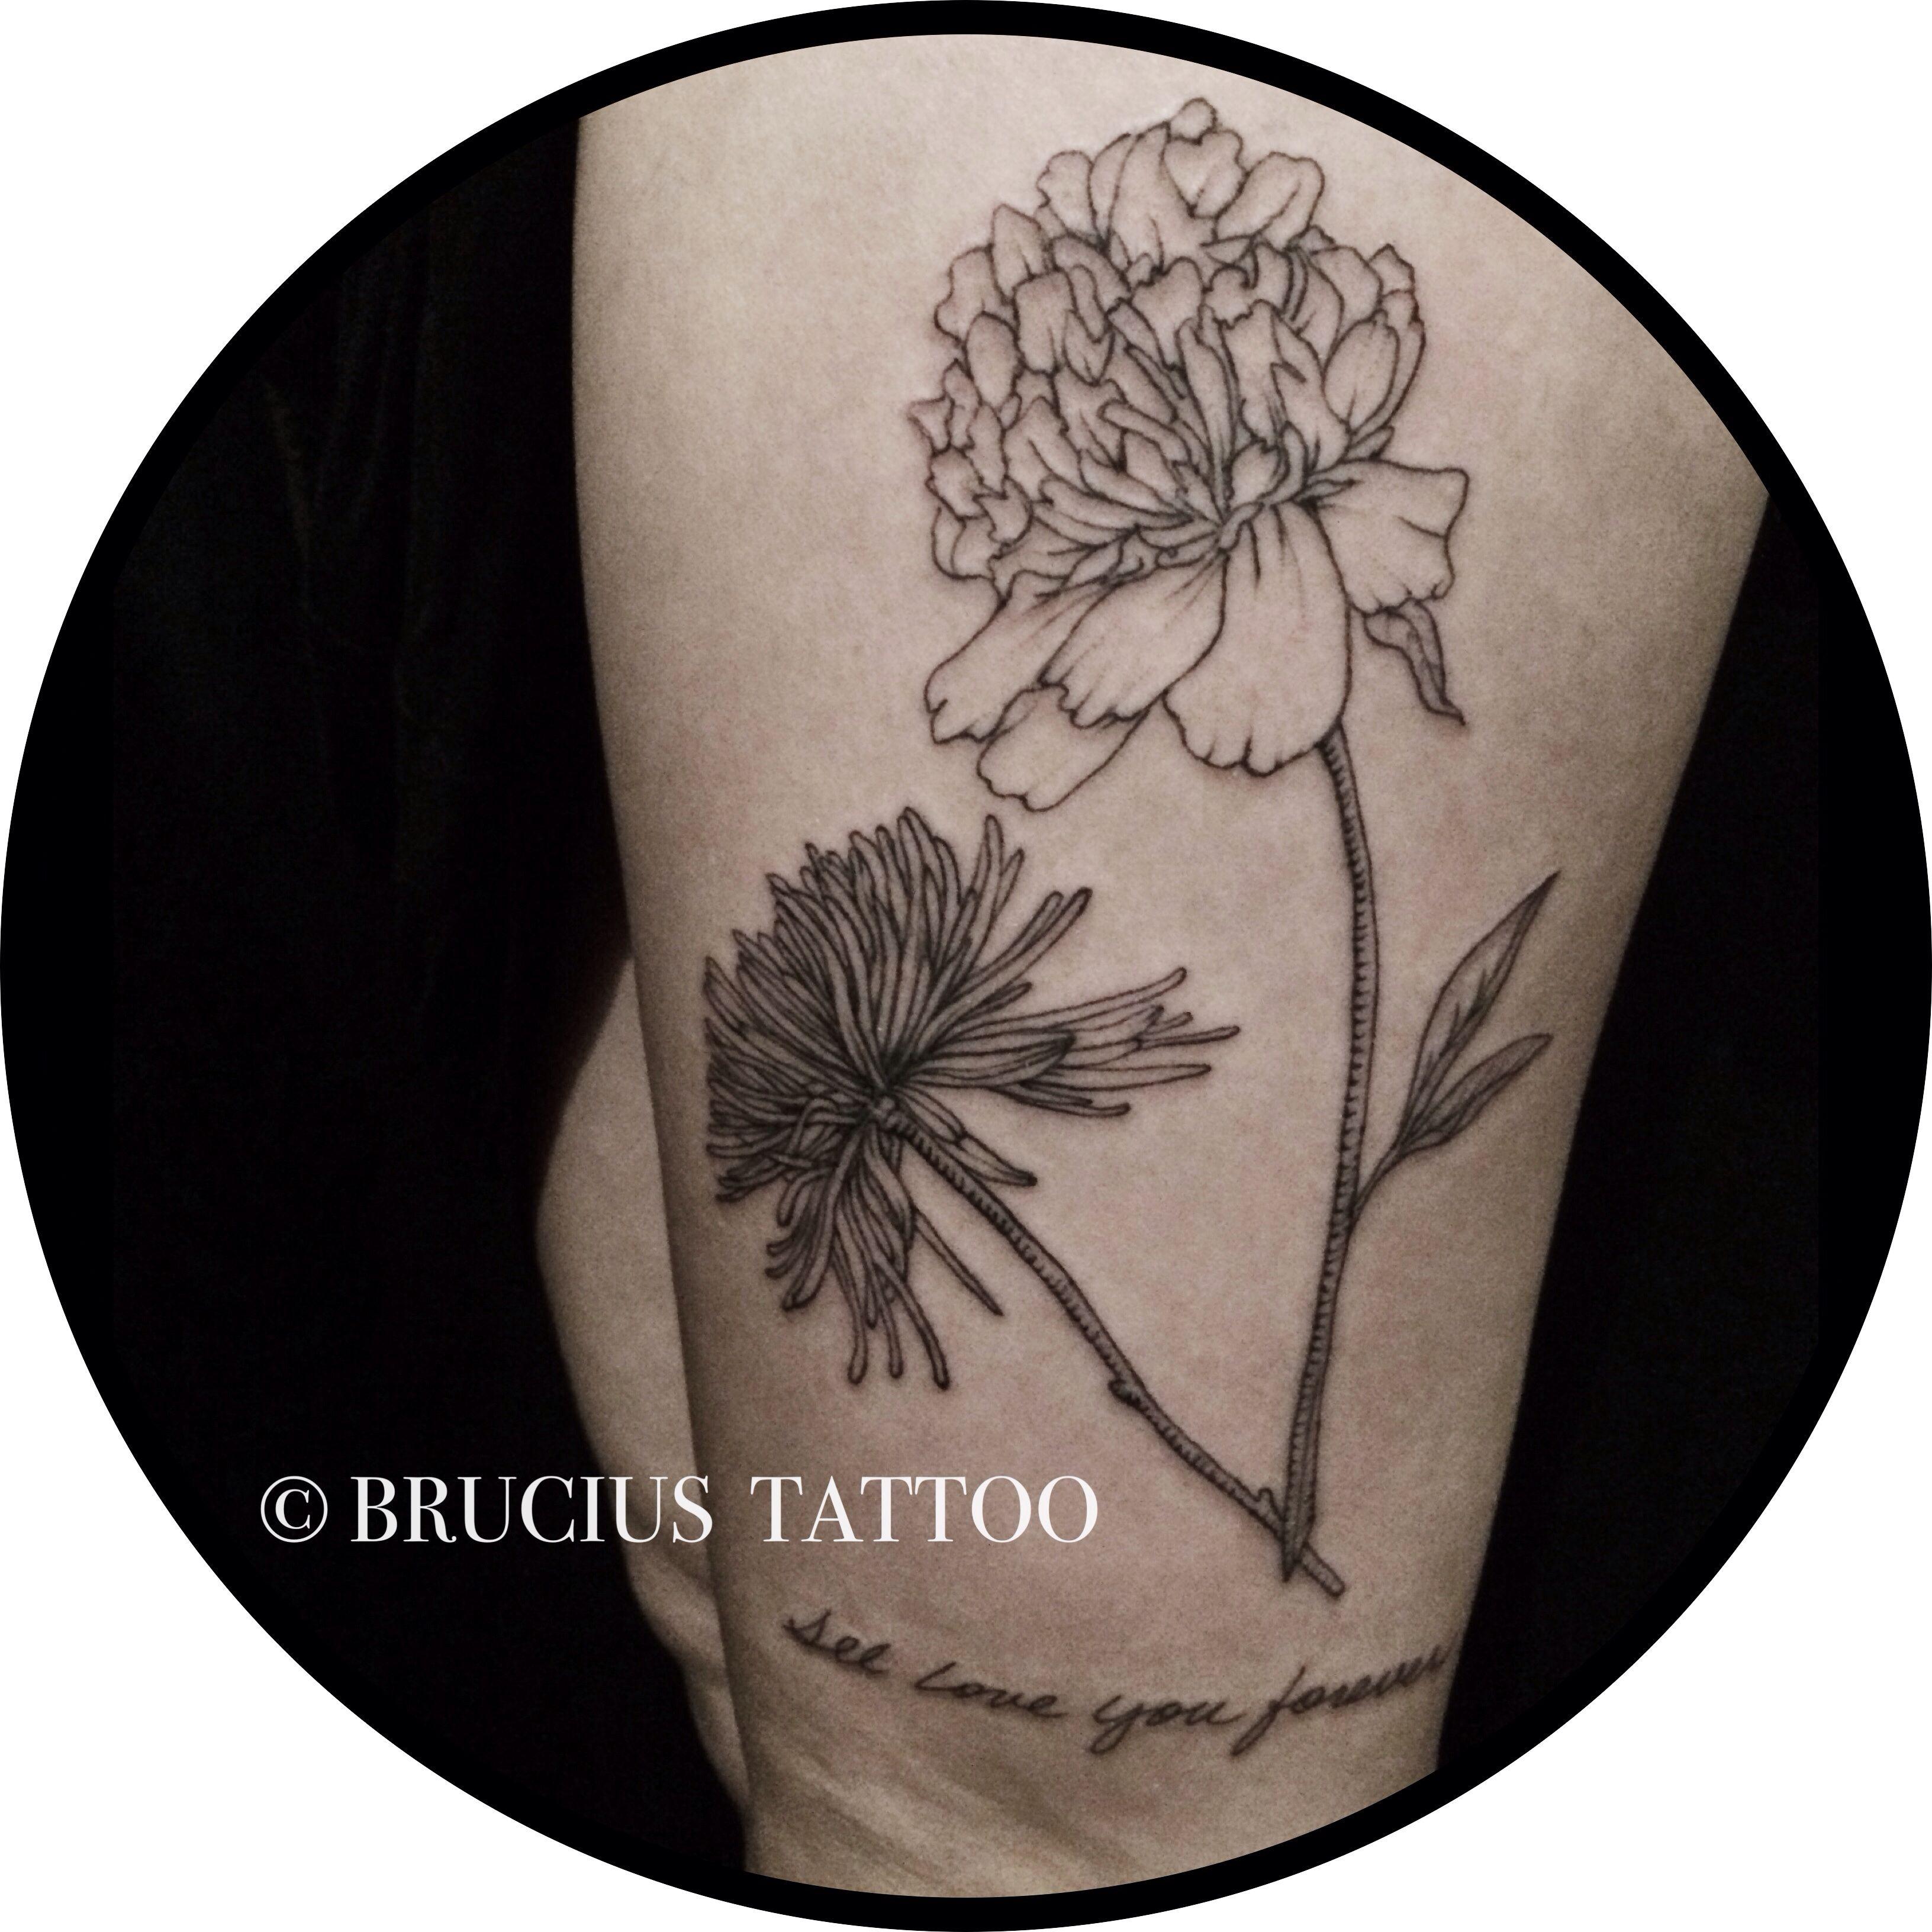 BRUCIUS TATTOO SF engraving etching flora flowers